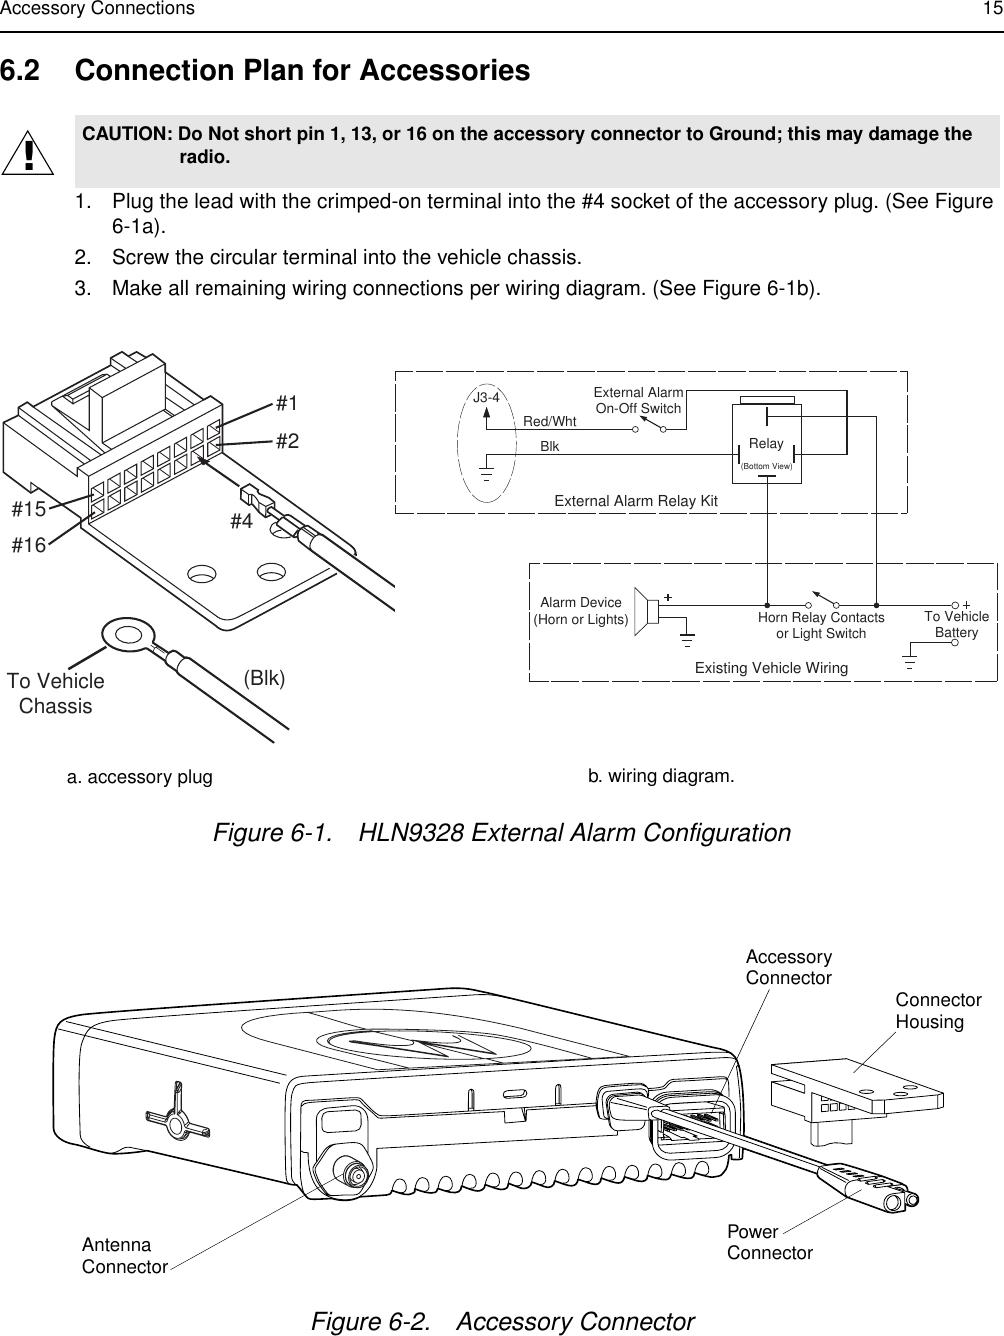 motorola solutions 99ft3049 cm200 cm300 vhf mobile radio user manual rh usermanual wiki Motorola CM300 Programming Software Motorola CM300 Programming Software